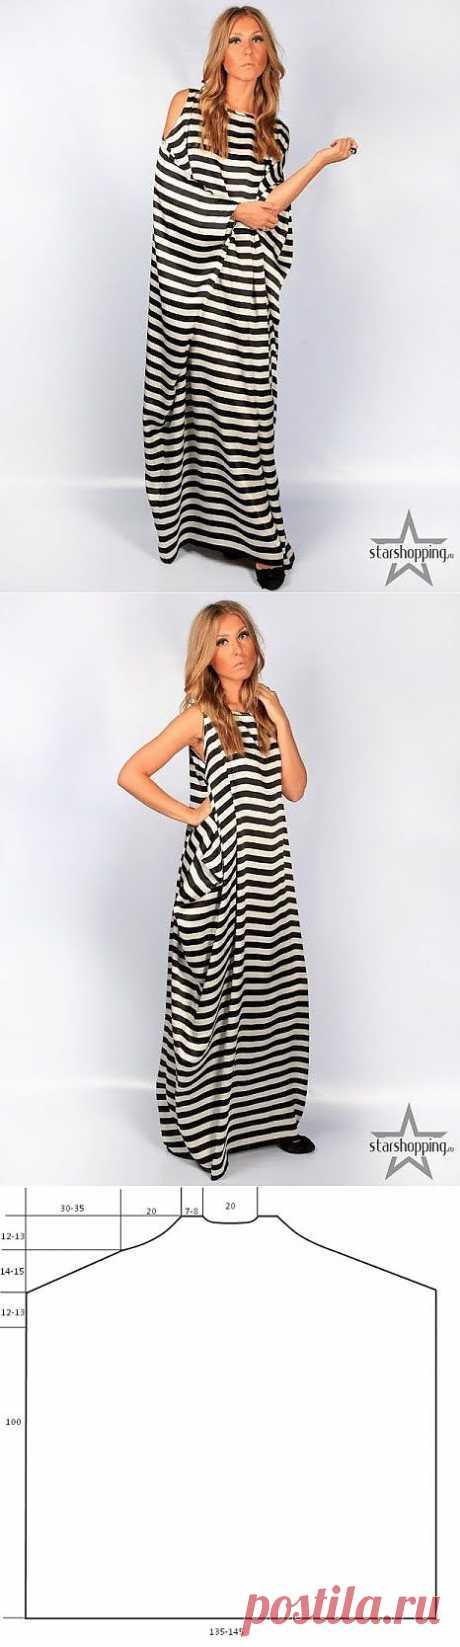 Original striped dresses (patterns) \/ Simple patterns \/